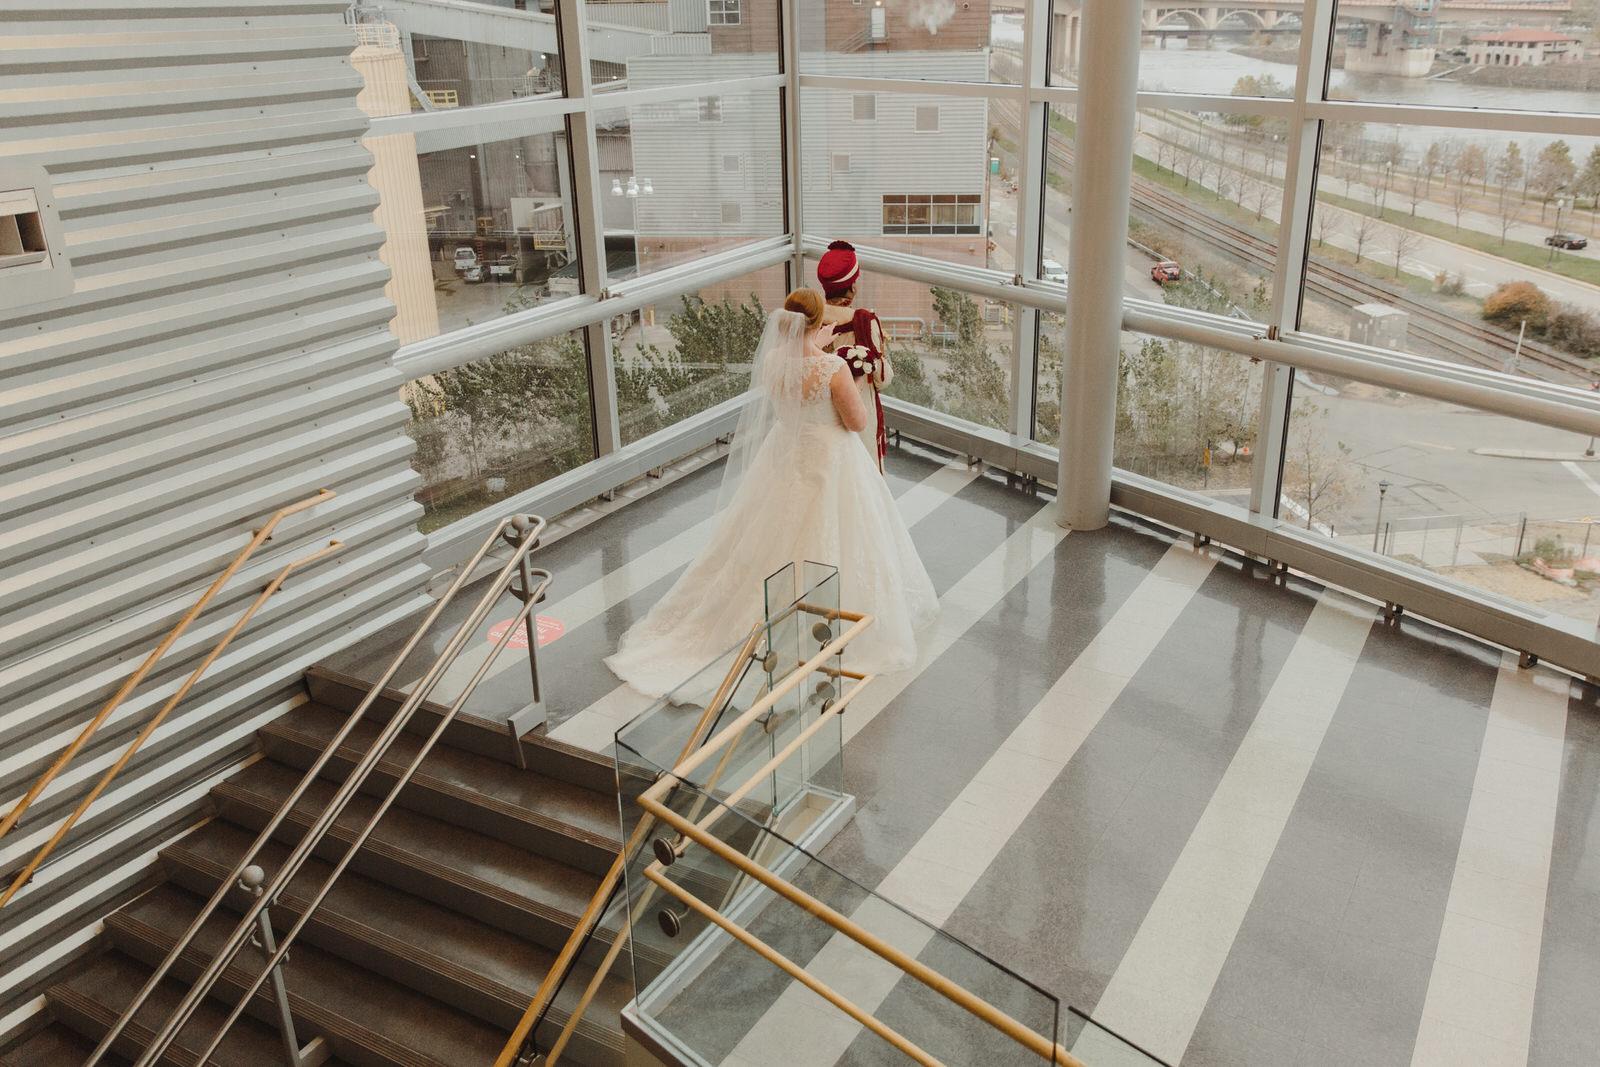 bride surprising groom for first look